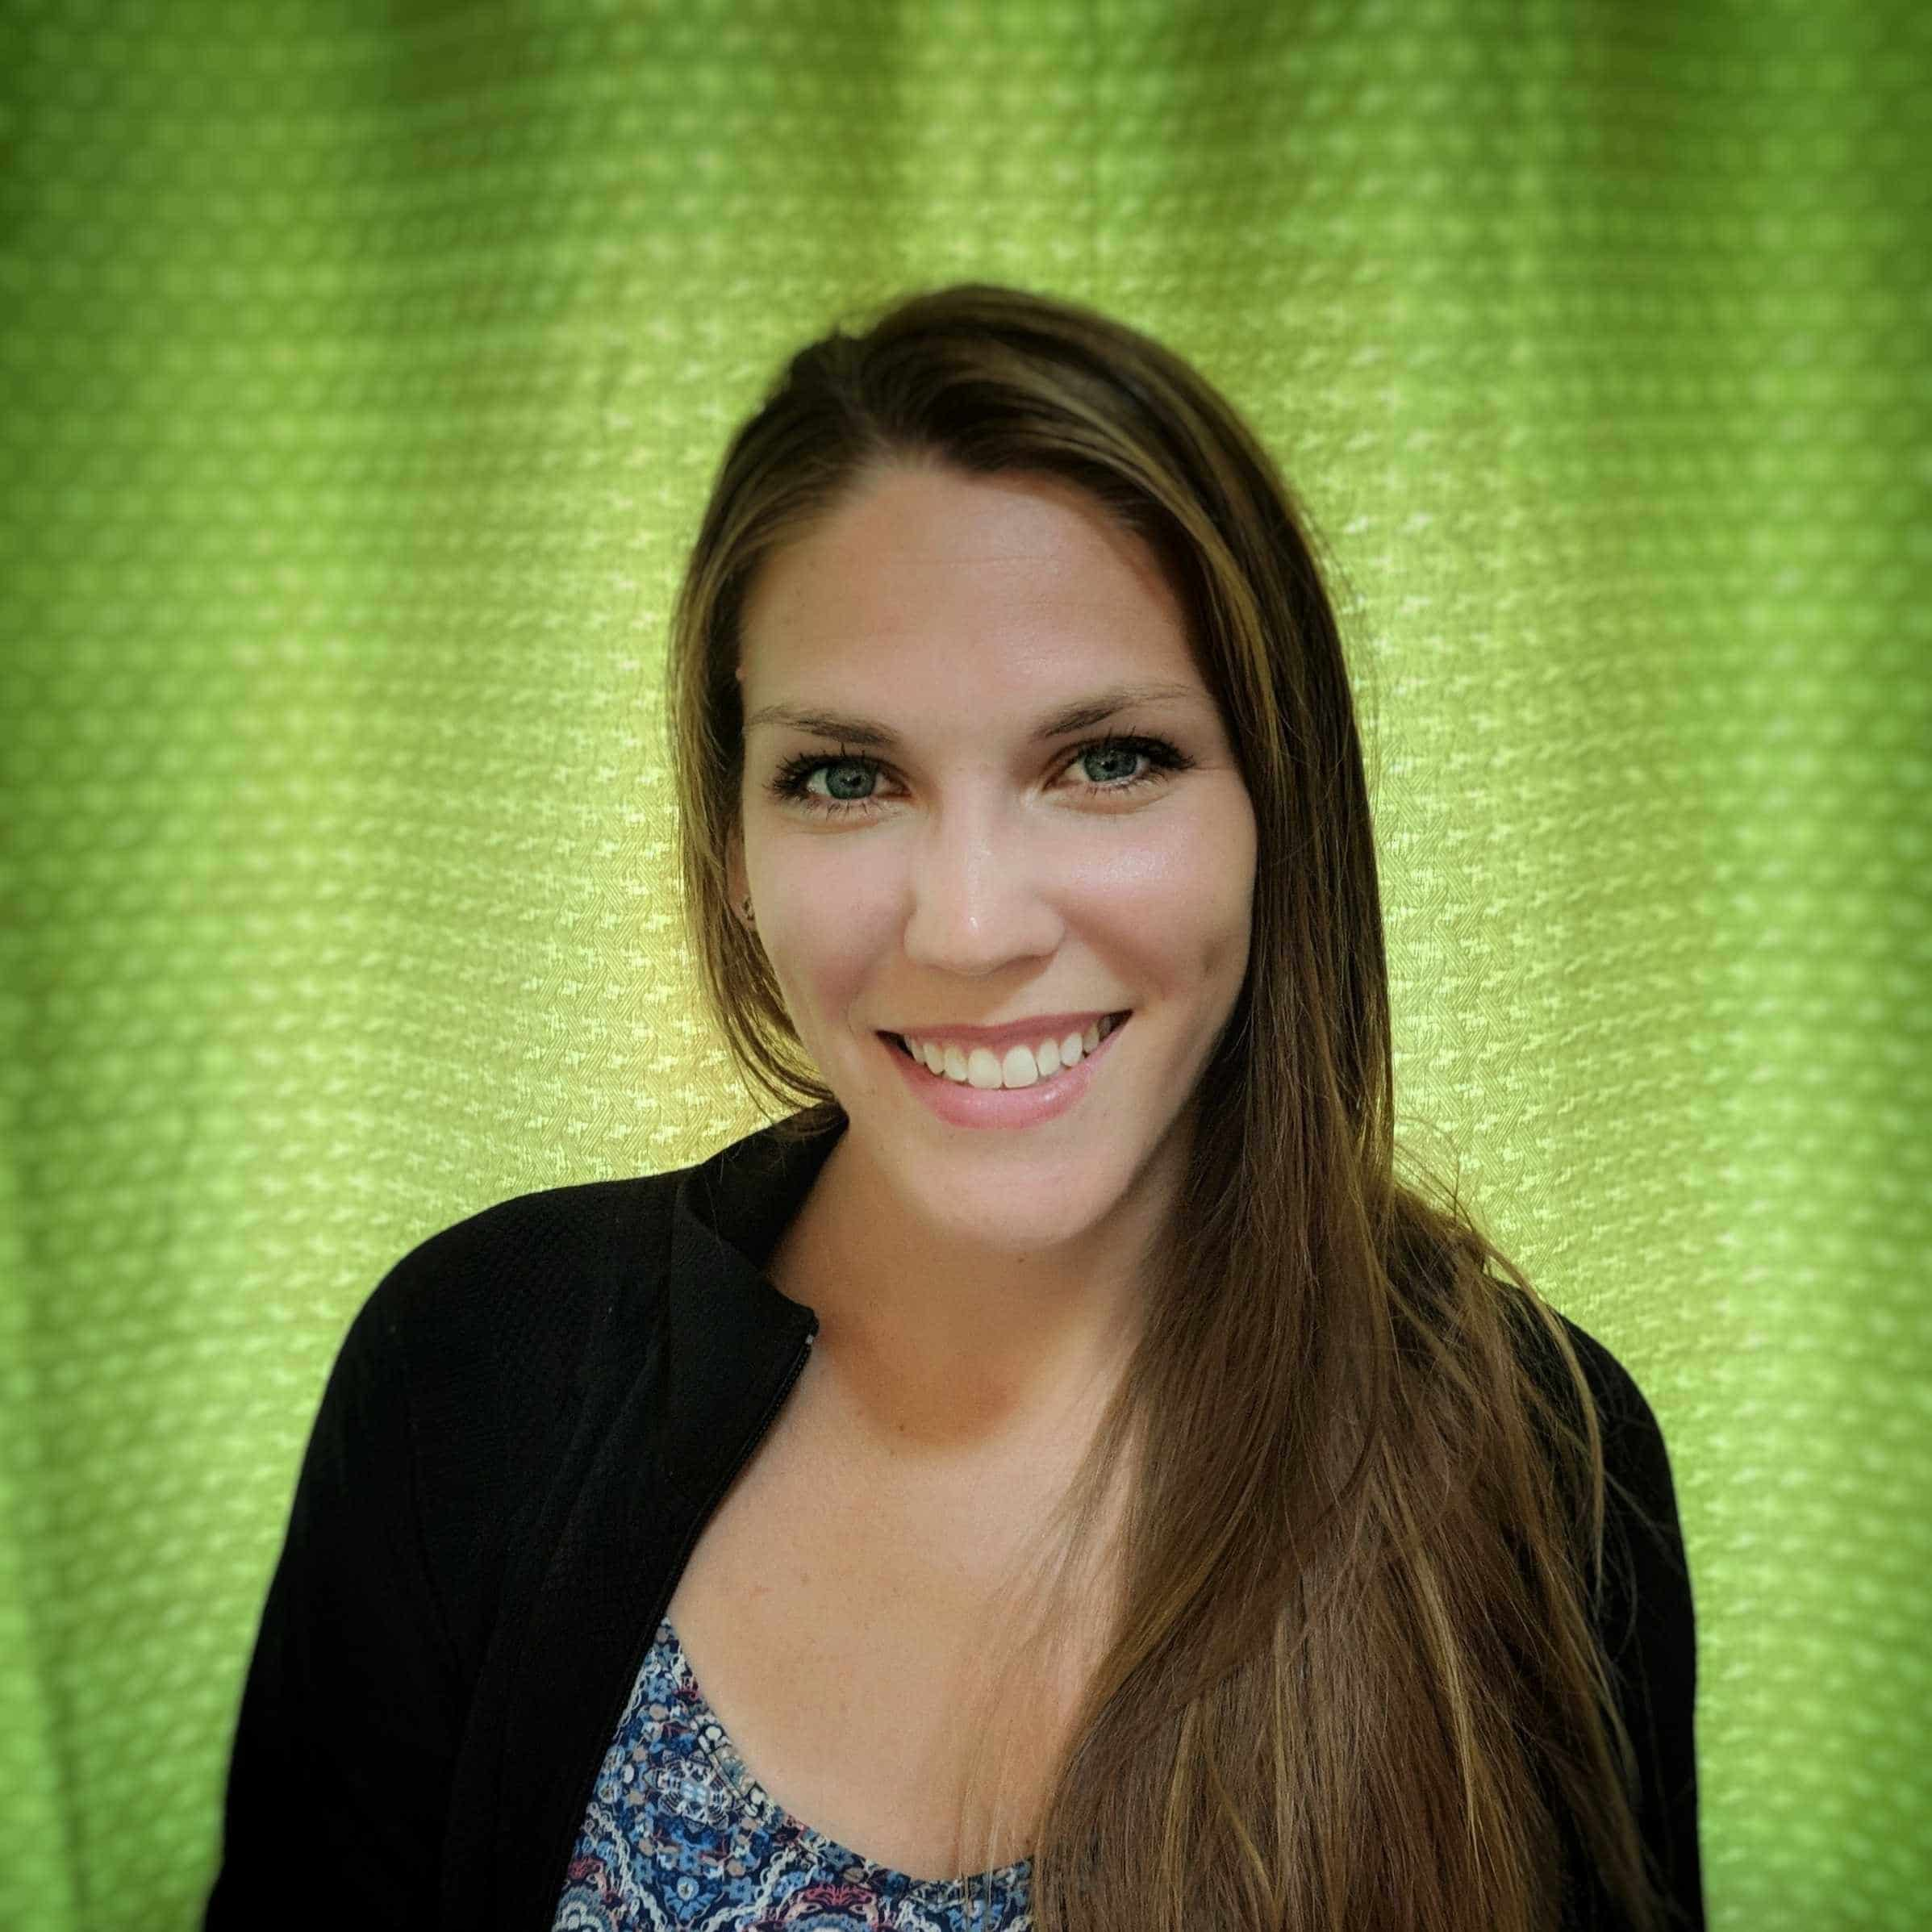 Lauren Templeton Owner of Apheleia Speech